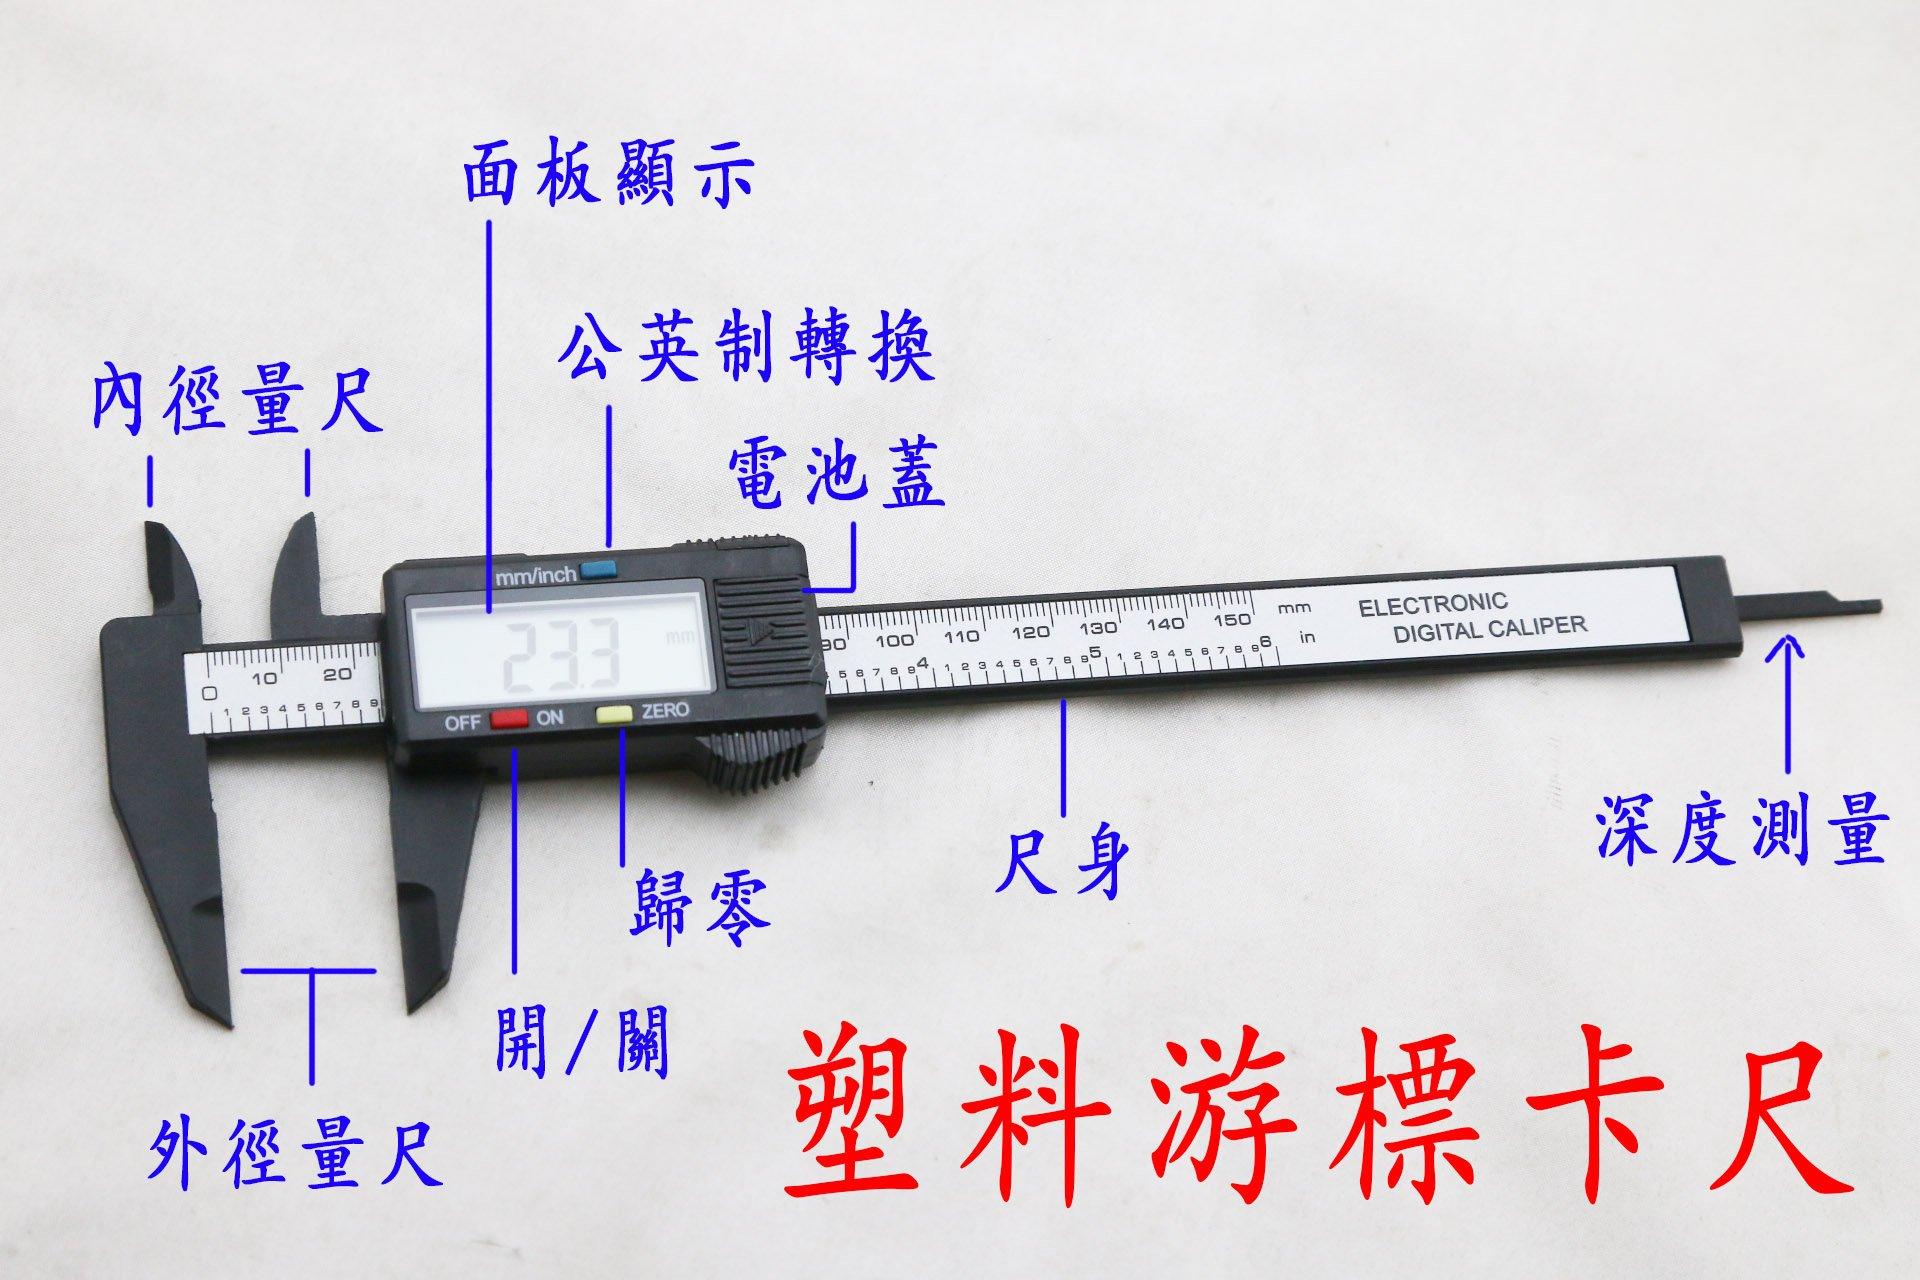 150MM 游標卡尺 全塑料 PA66 量測 翡翠 玉石 玉髓 珠寶  電子 螢幕顯示 緬甸玉